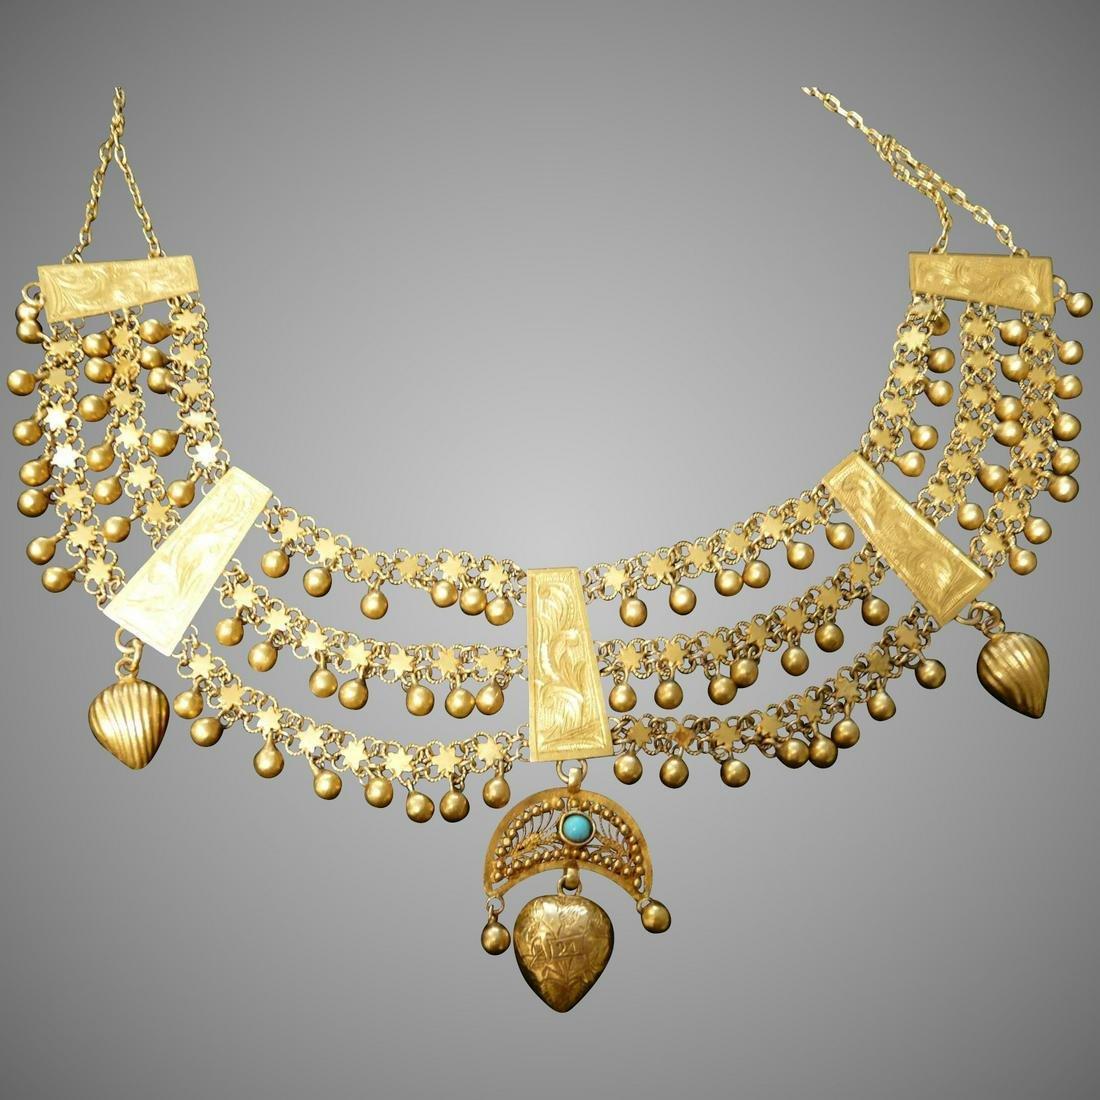 Vintage Kurdish 21 karat Gold dowry necklace